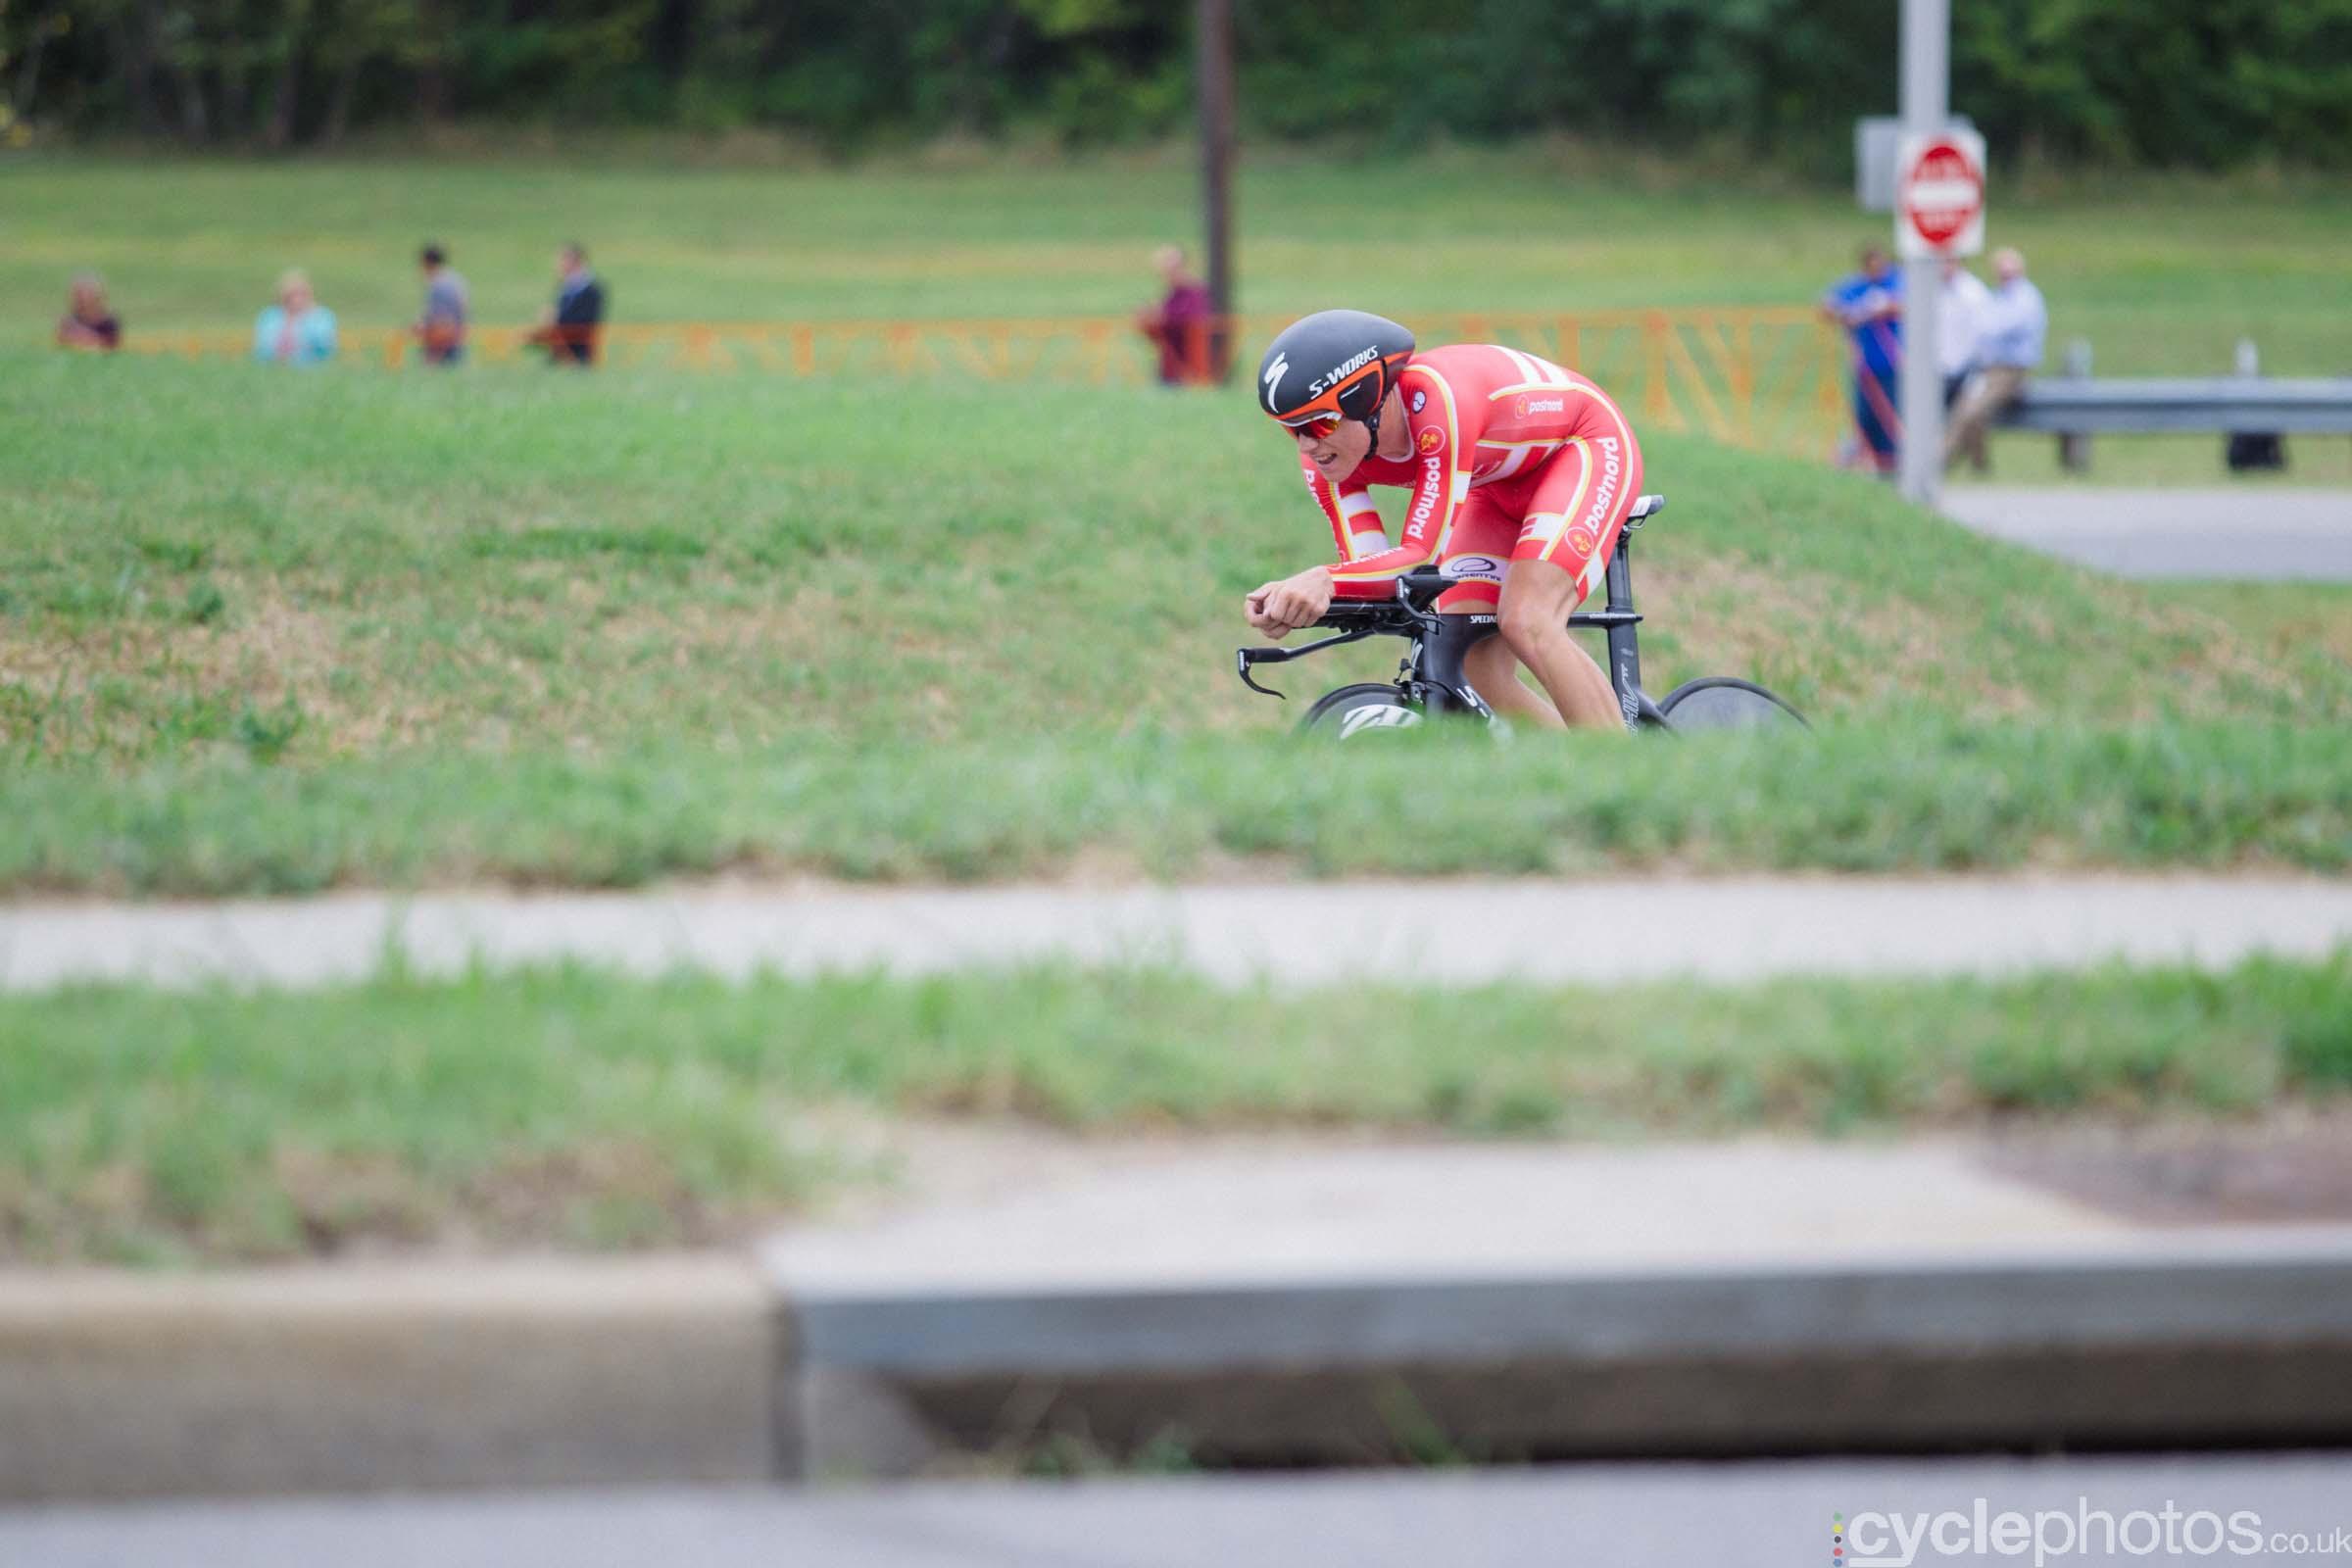 cyclephotos-world-champs-richmond-123225